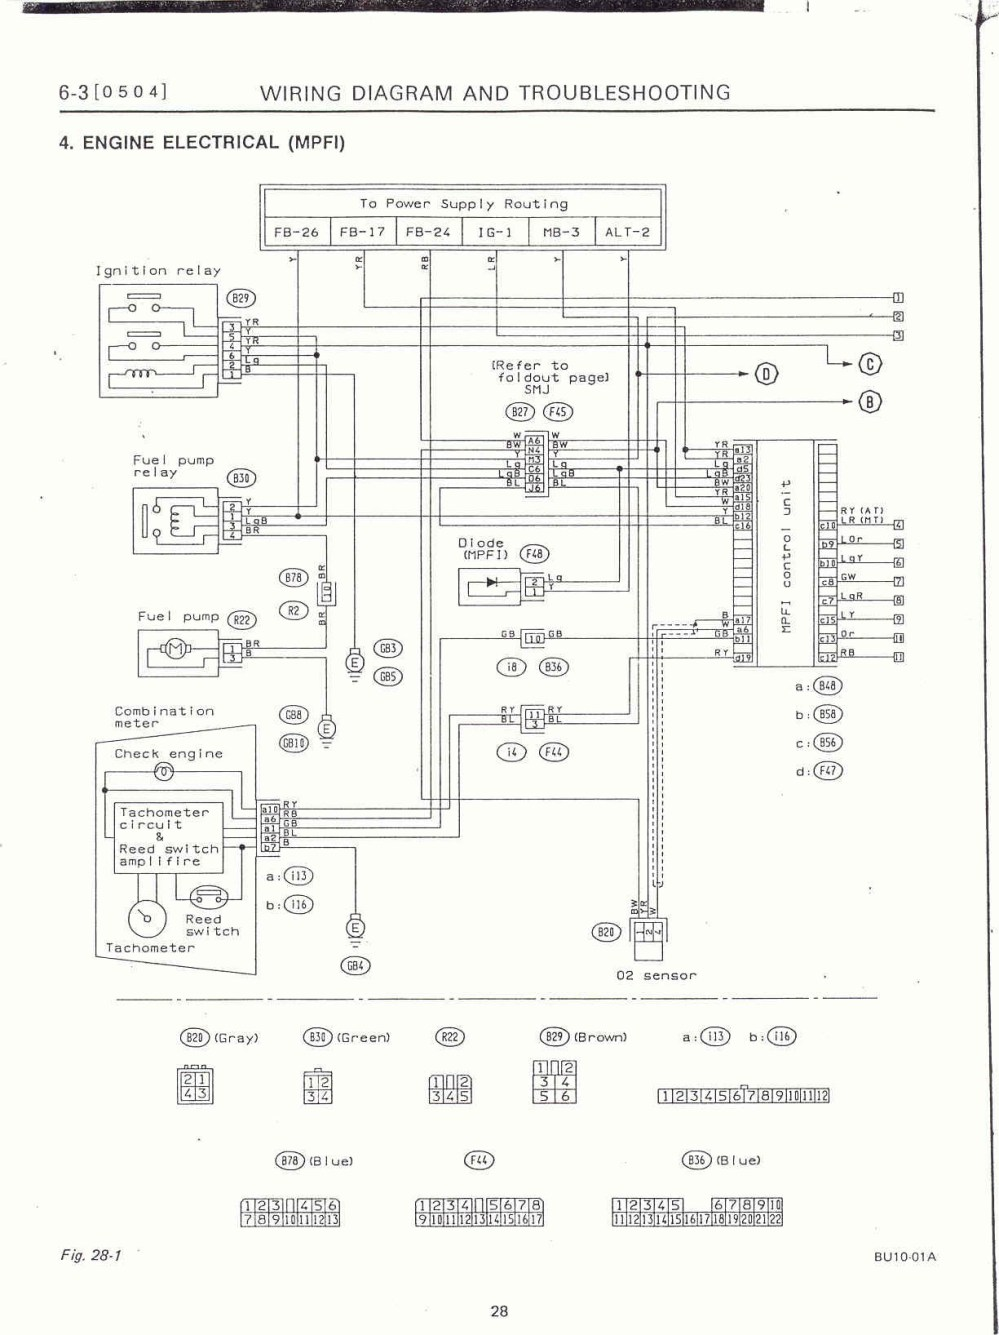 medium resolution of subaru impreza wiring diagram 2000 rs schema diagram databasesubaru impreza wiring diagram 2000 rs wiring library